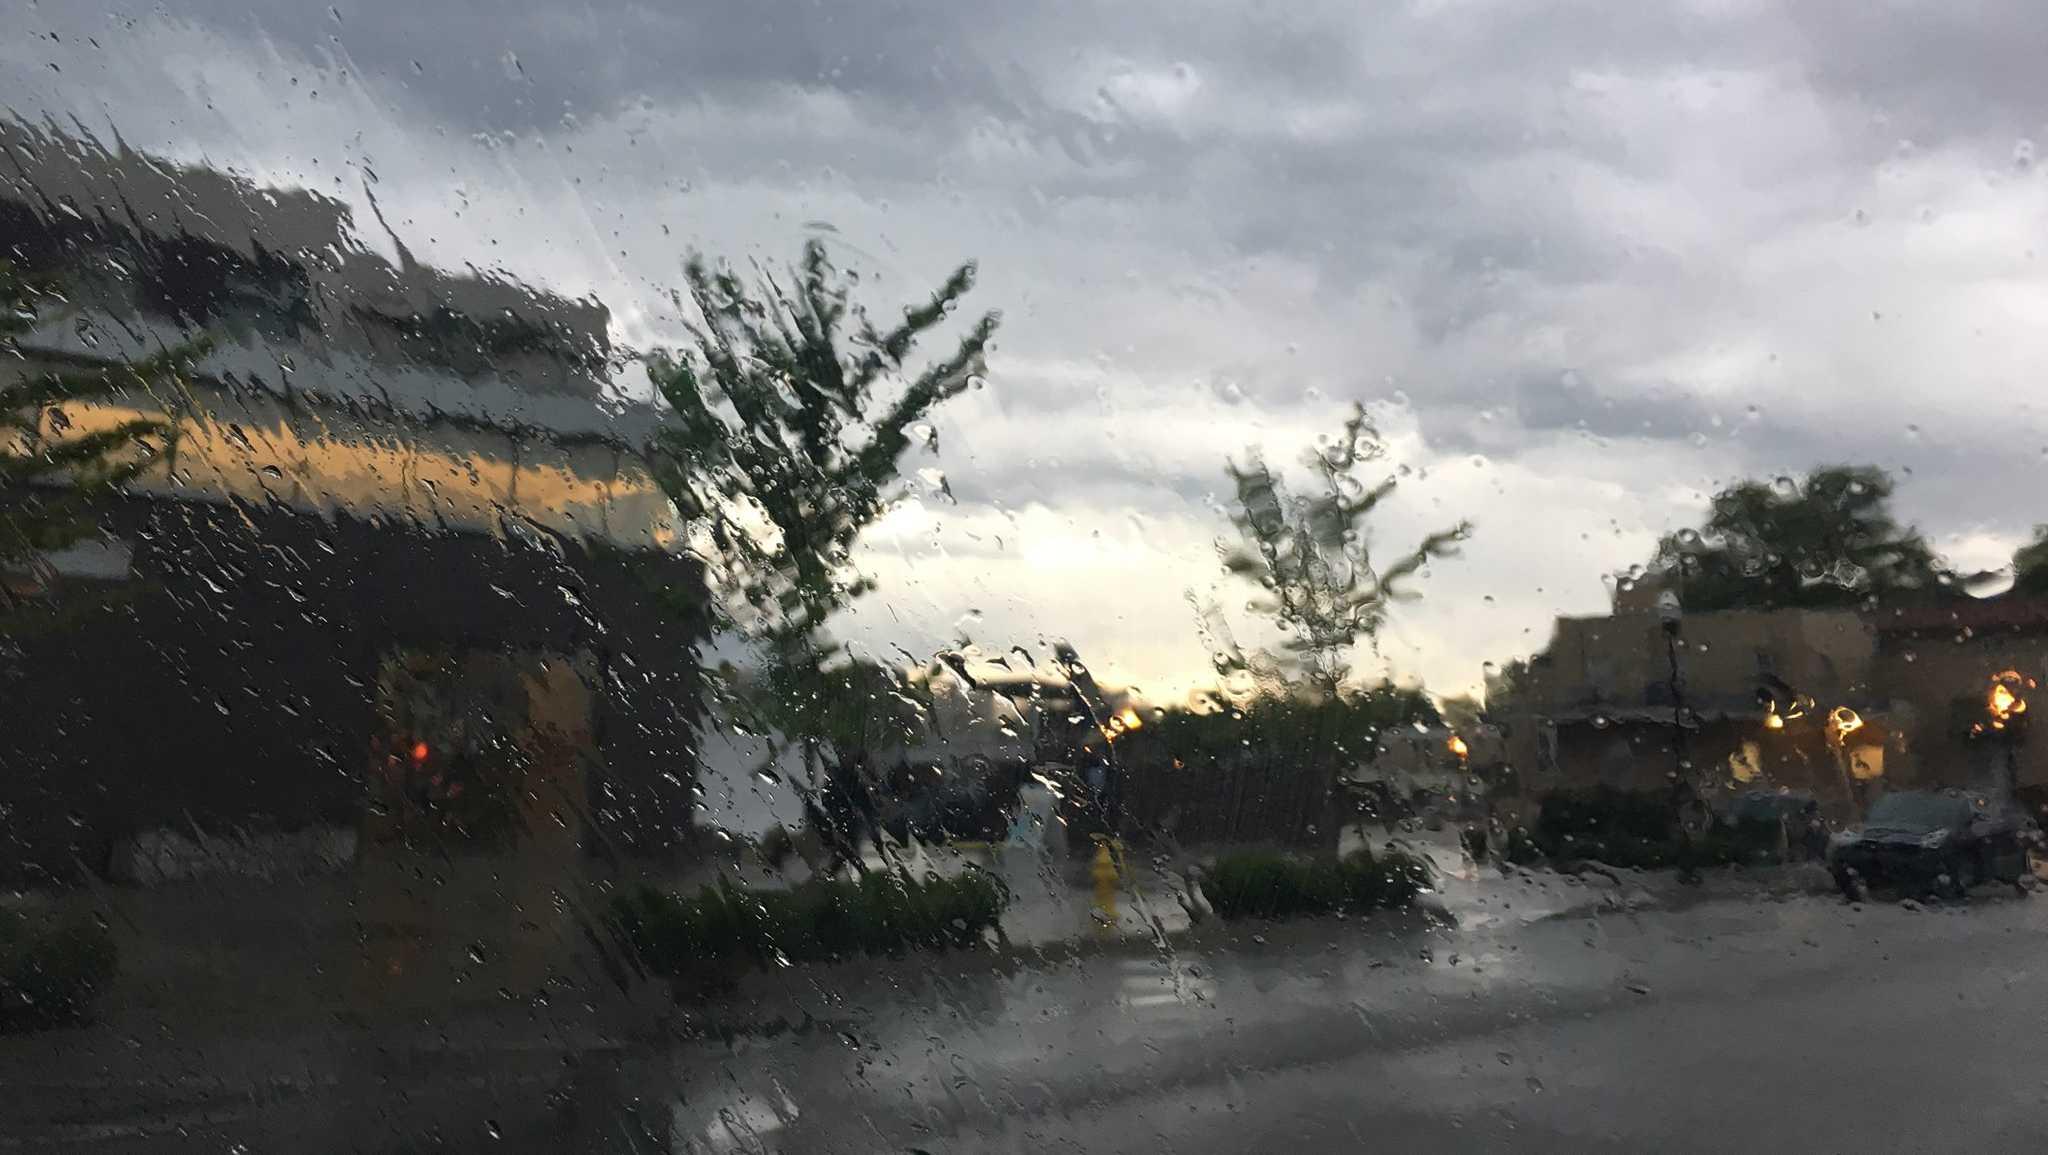 Rain in Bentonville